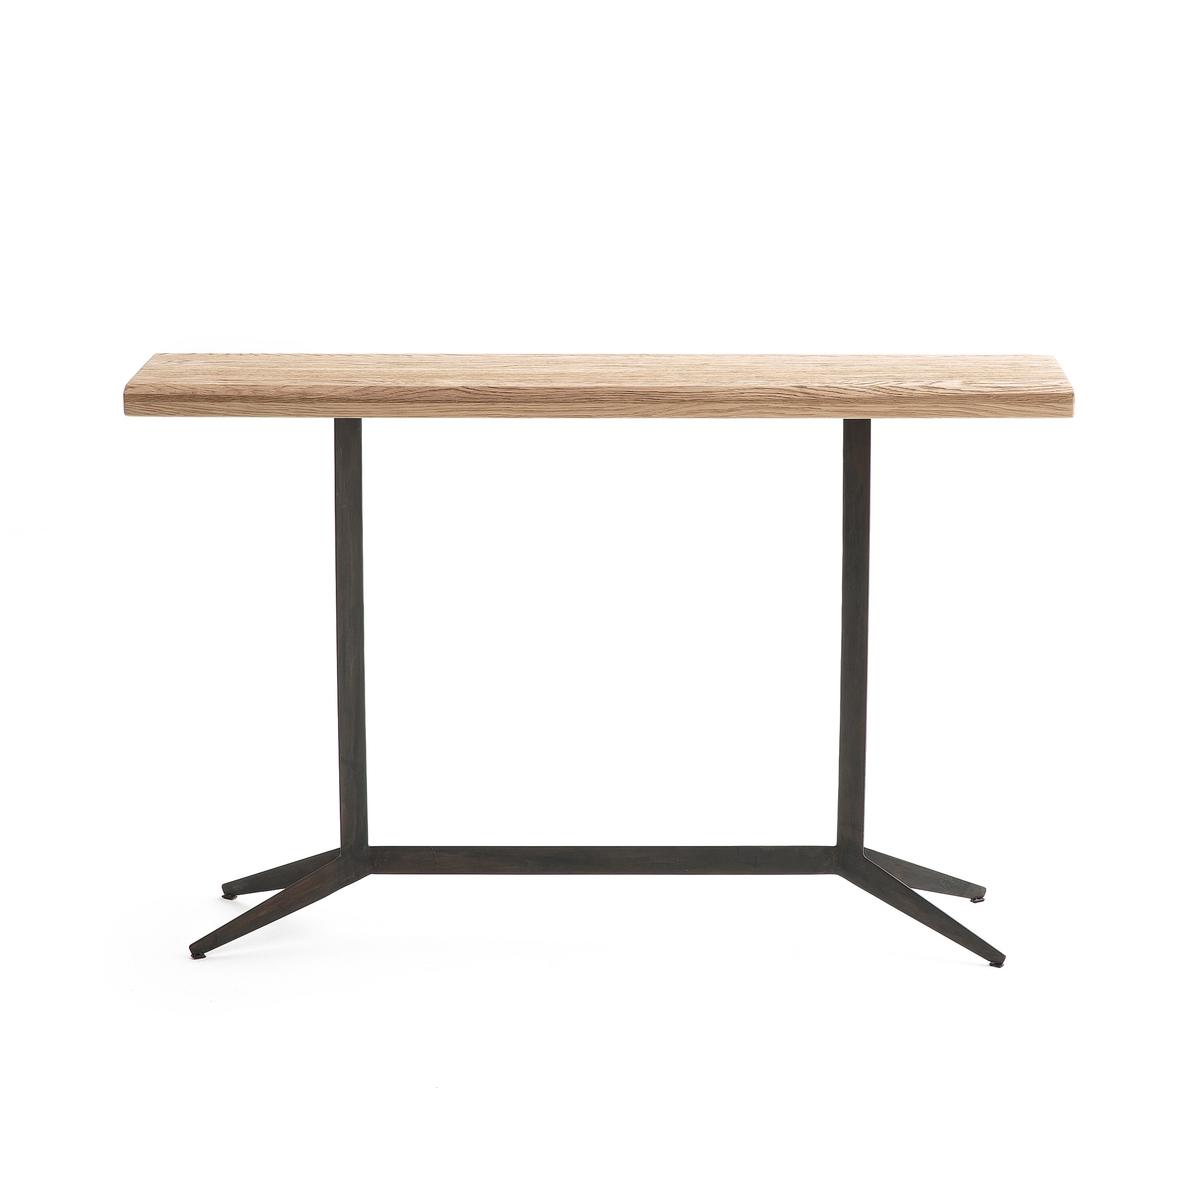 Столик со столешницей из массива дуба Rudemar столик из массива дуба ariles